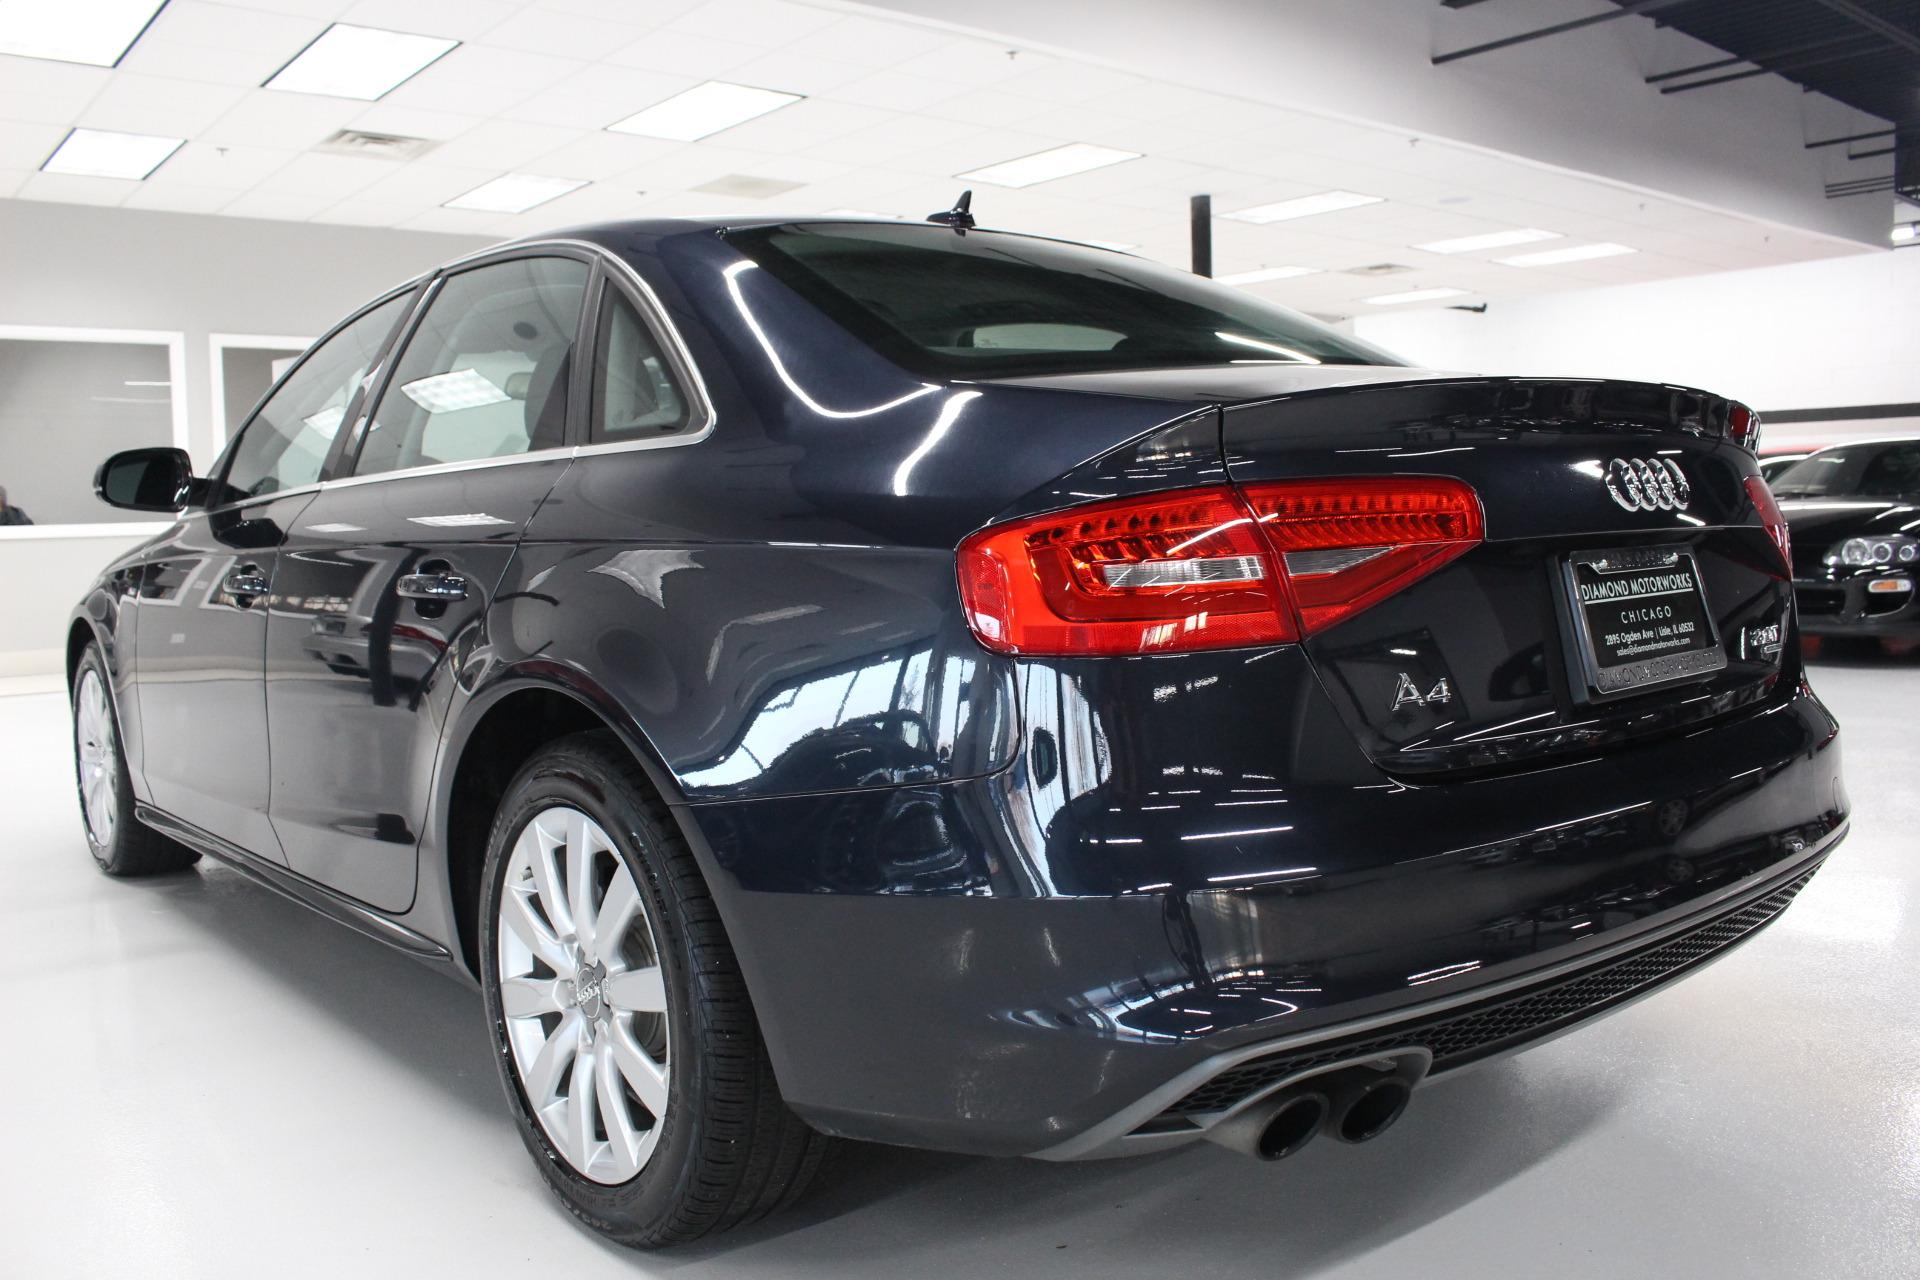 2015 audi a4 4dr sedan manual quattro 2 0t premium stock 017891 rh diamondmotorworks com 2009 Audi A4 Owner's Manual Audi A5 Manual